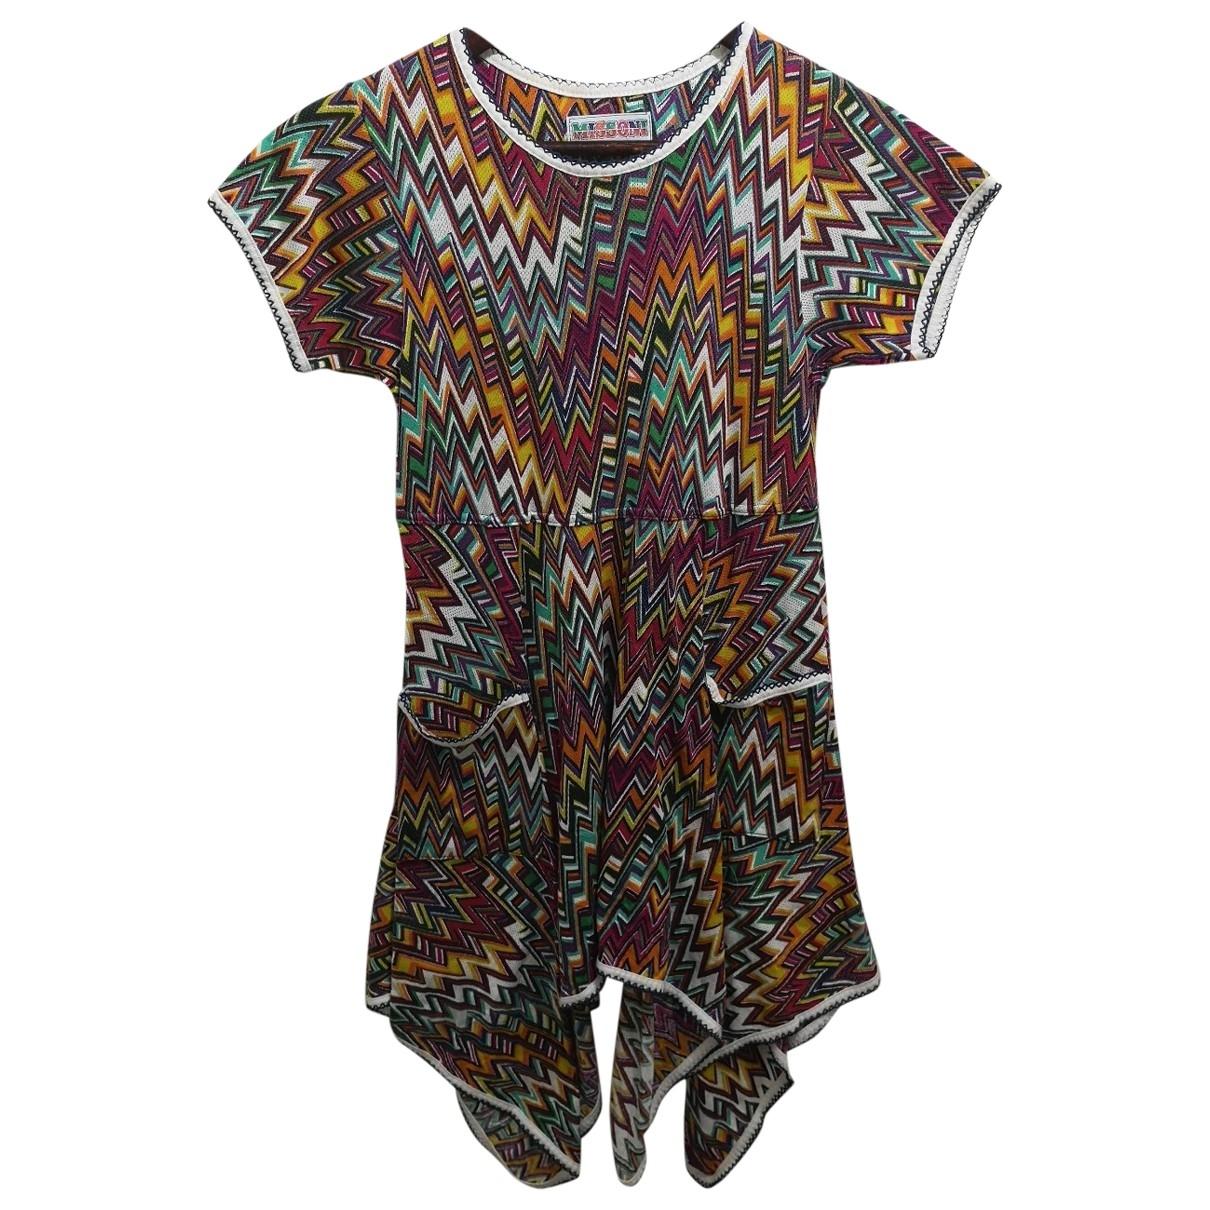 Missoni \N Multicolour Cotton dress for Women S International